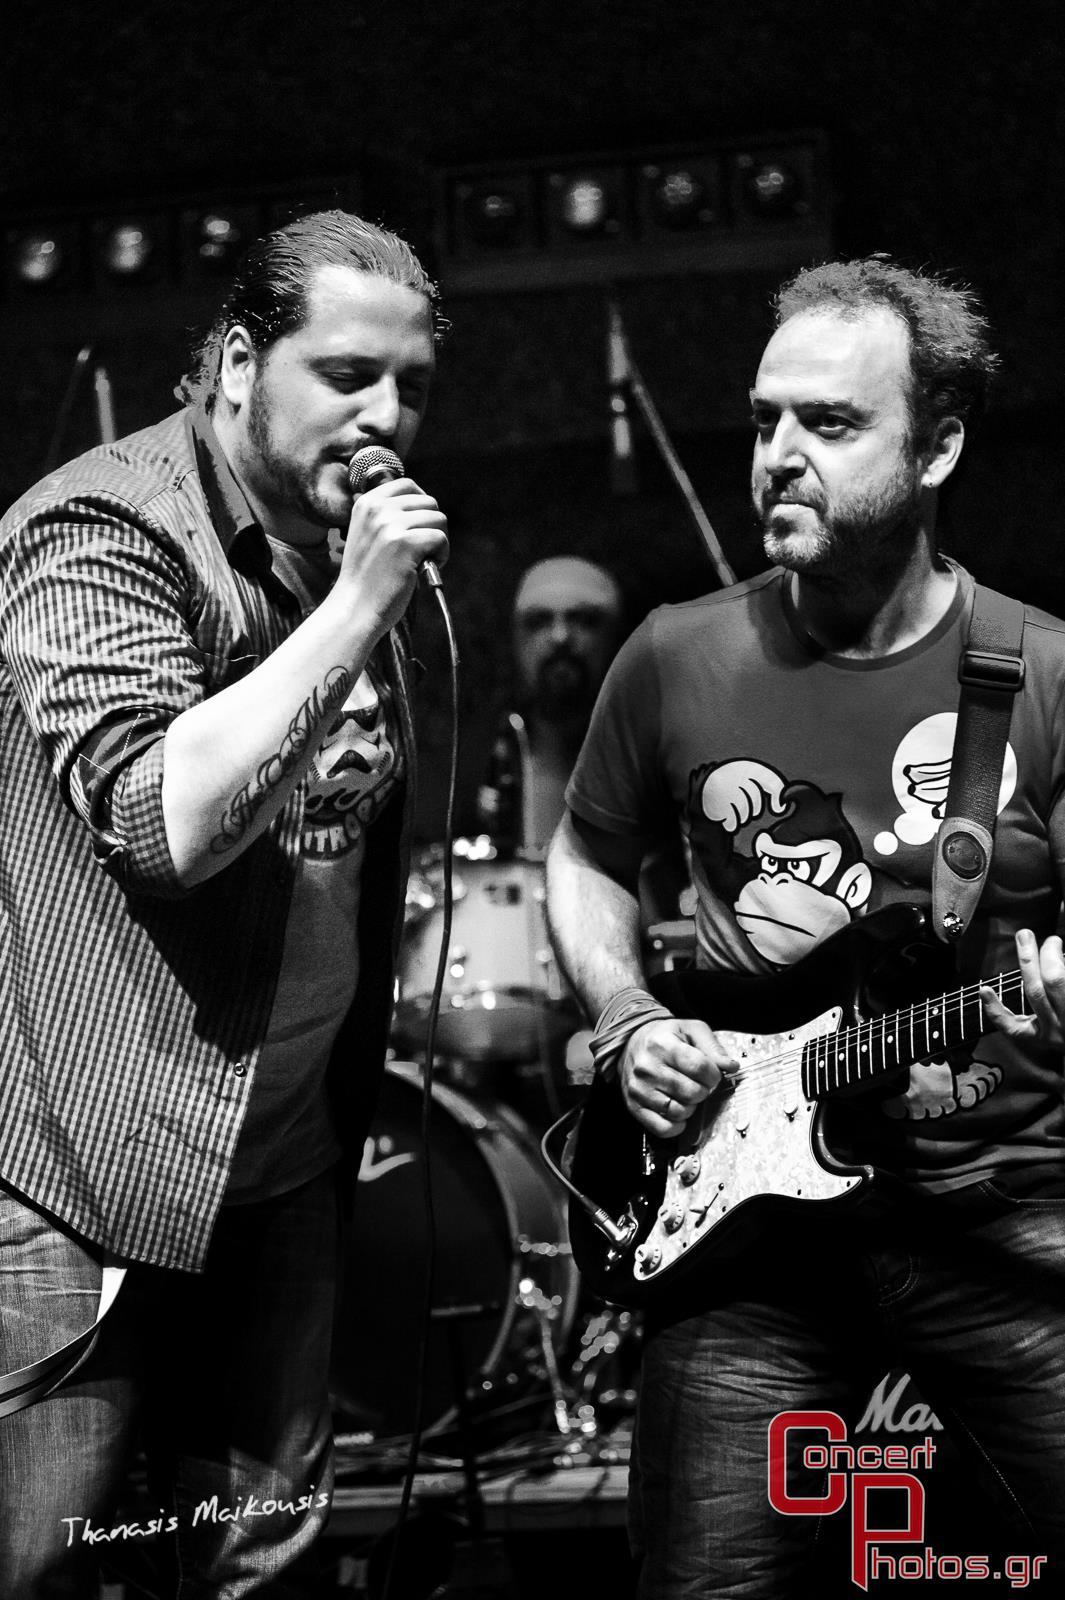 Locomondo- photographer:  - ConcertPhotos-3425